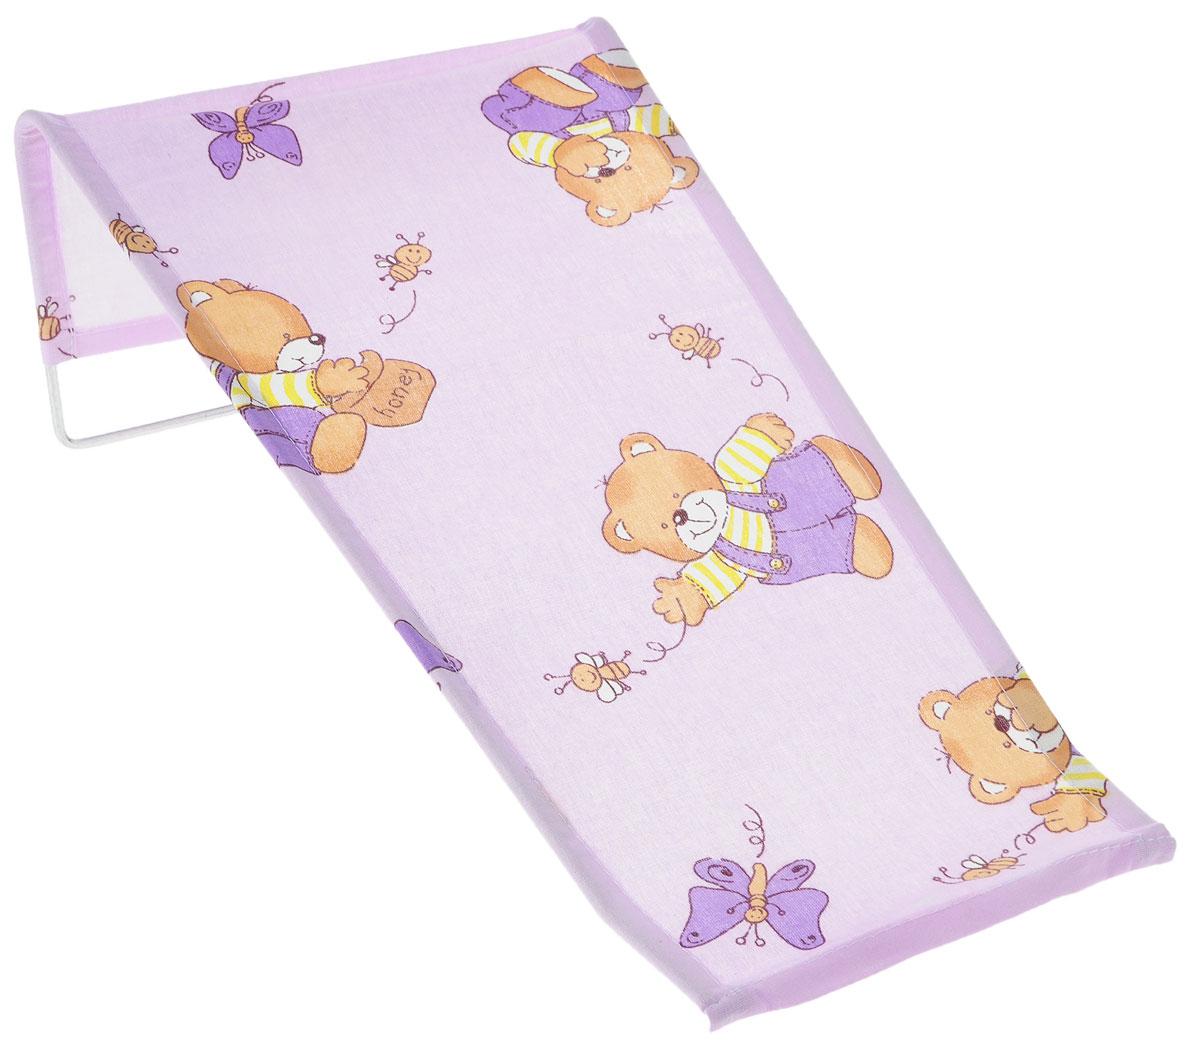 Фея Подставка для купания Мишка и пчелка цвет сиреневый 1332-01_мишка и пчелка/сиреневый